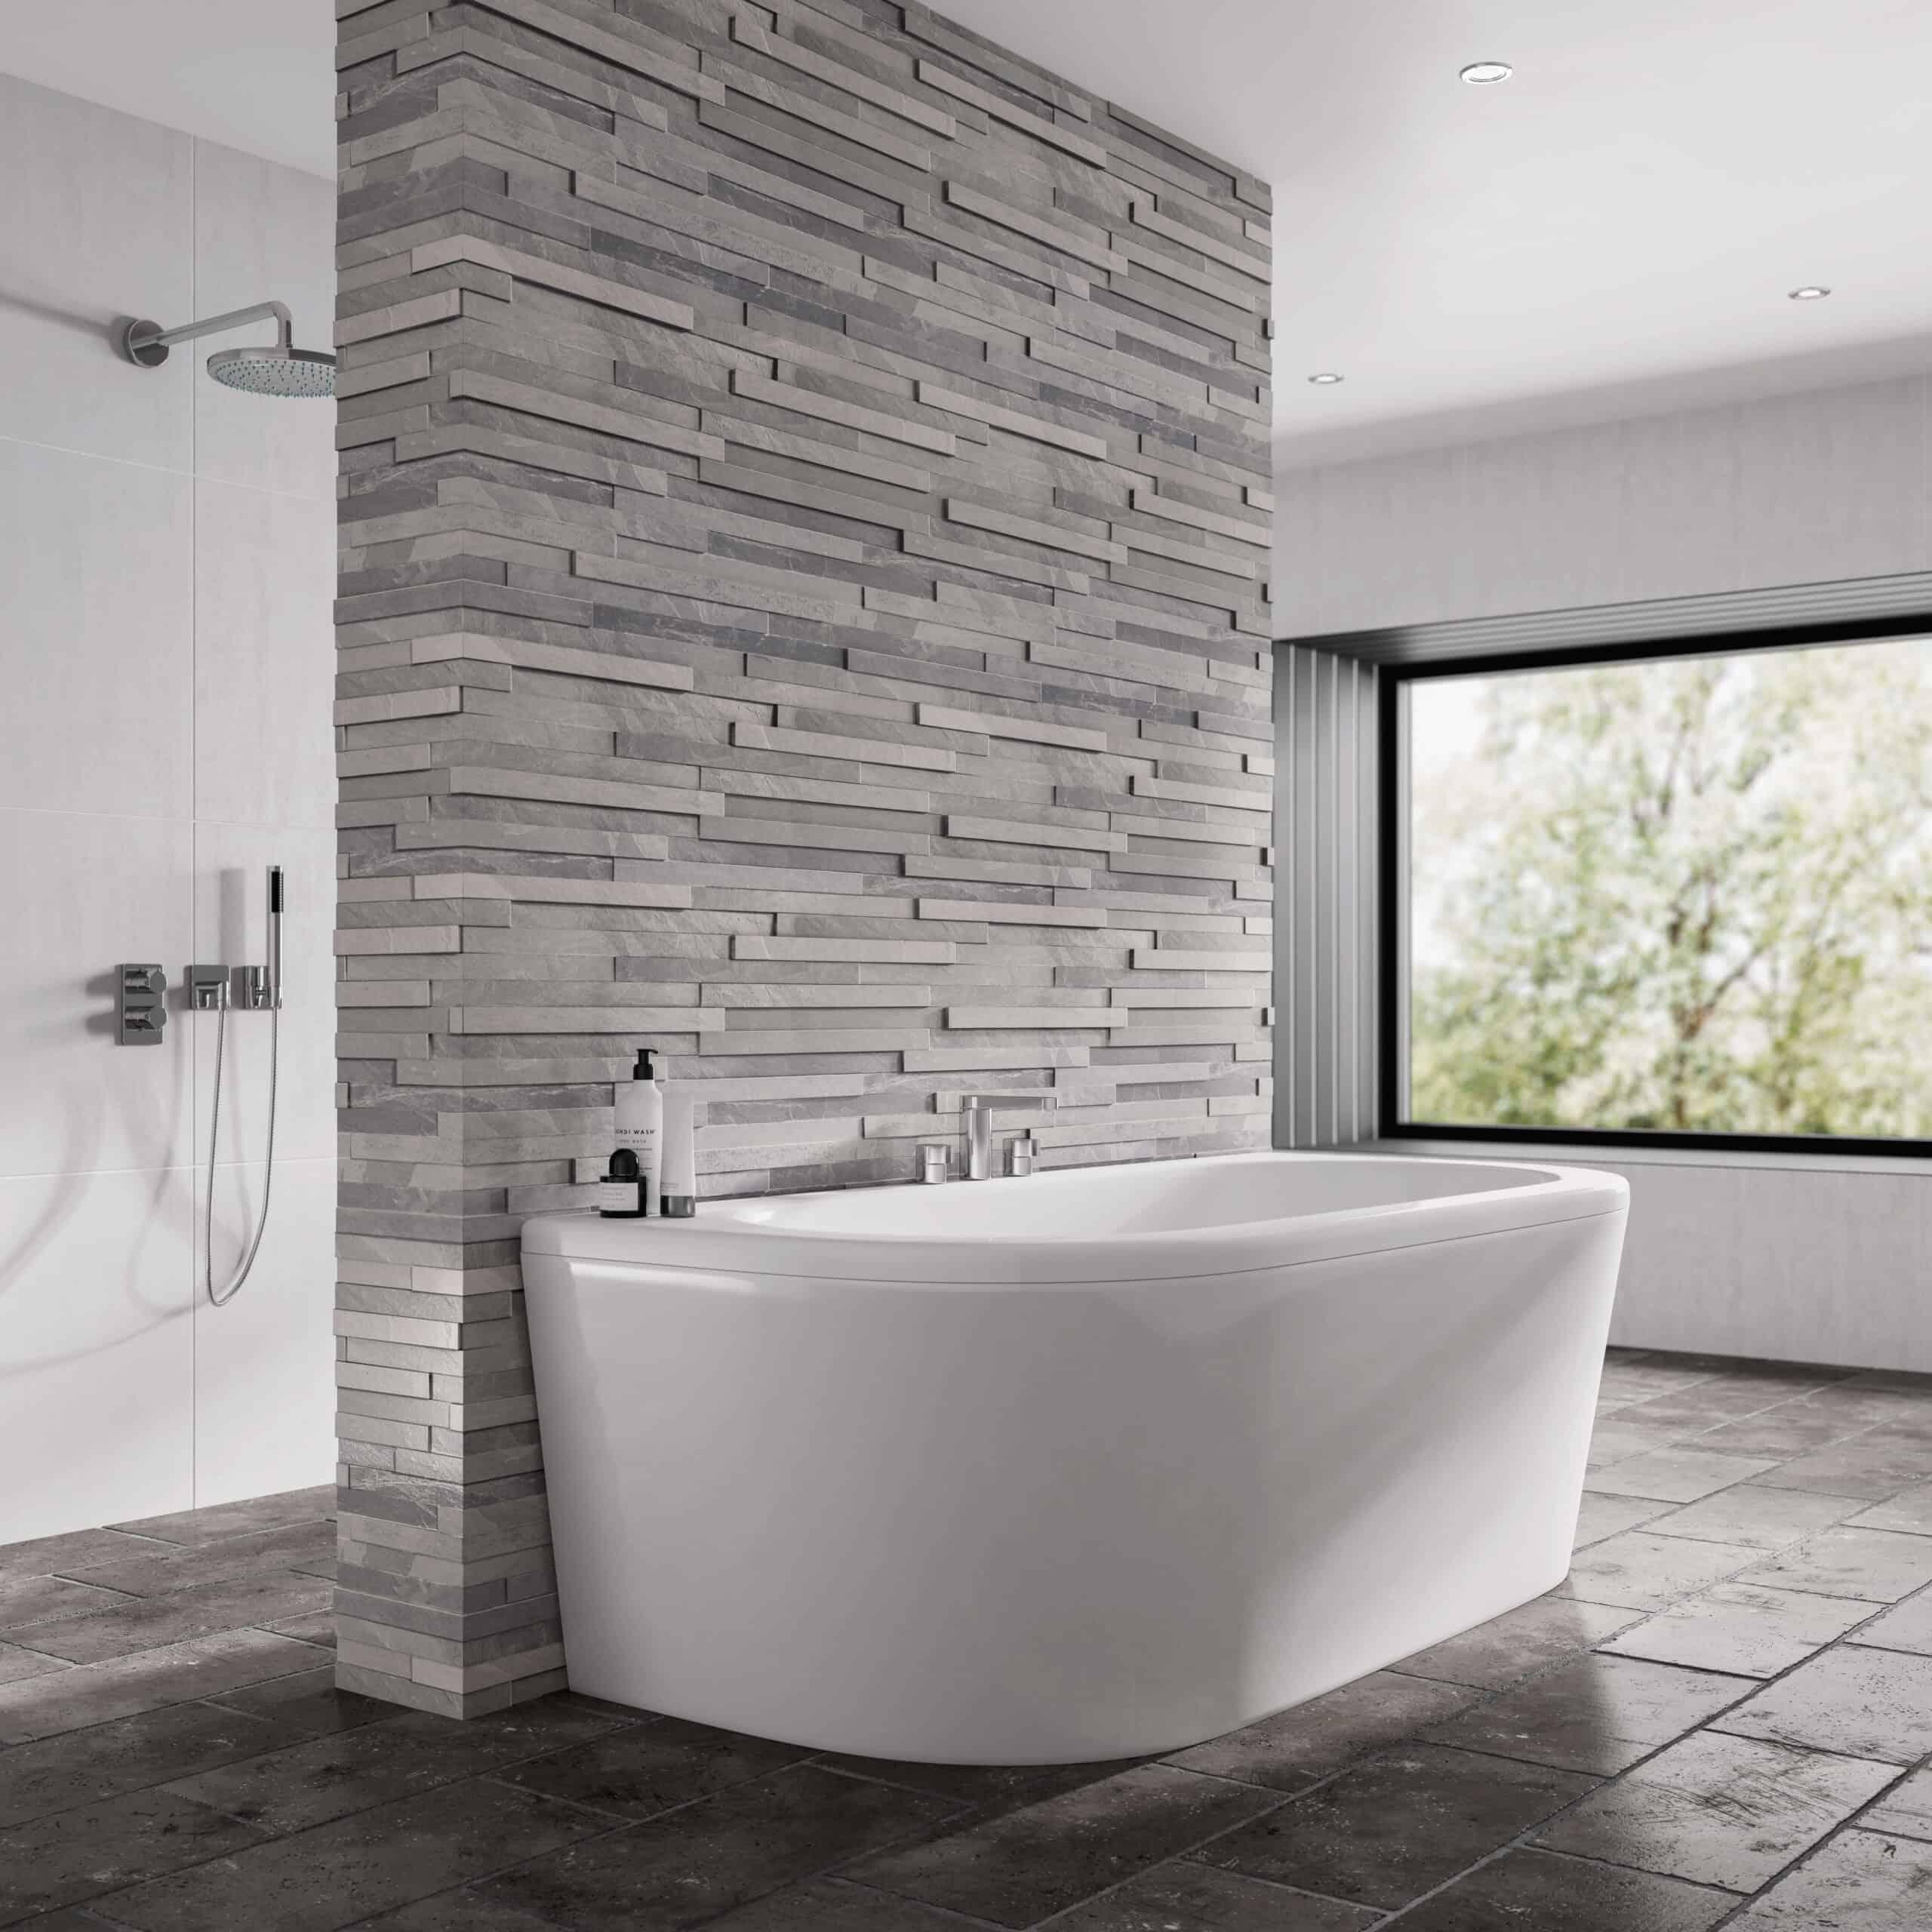 D Shape bath in a luxury bathroom space